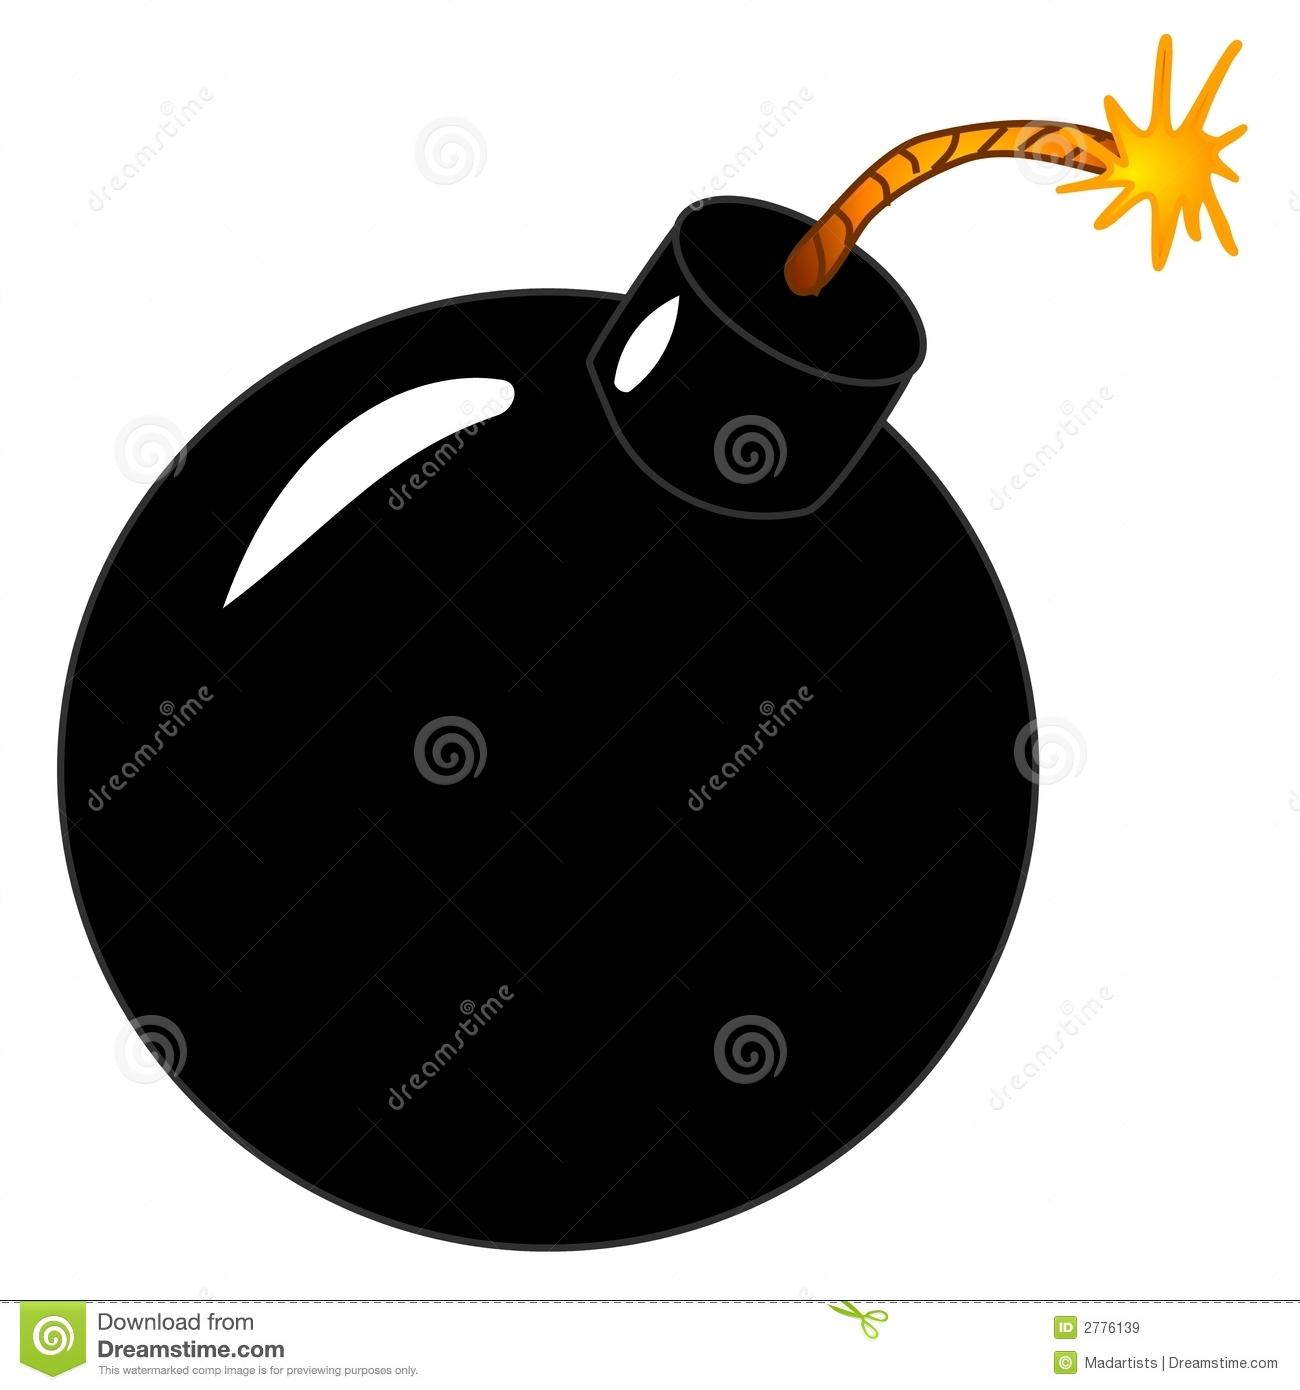 Bomb clipart clip art. Lit black round panda